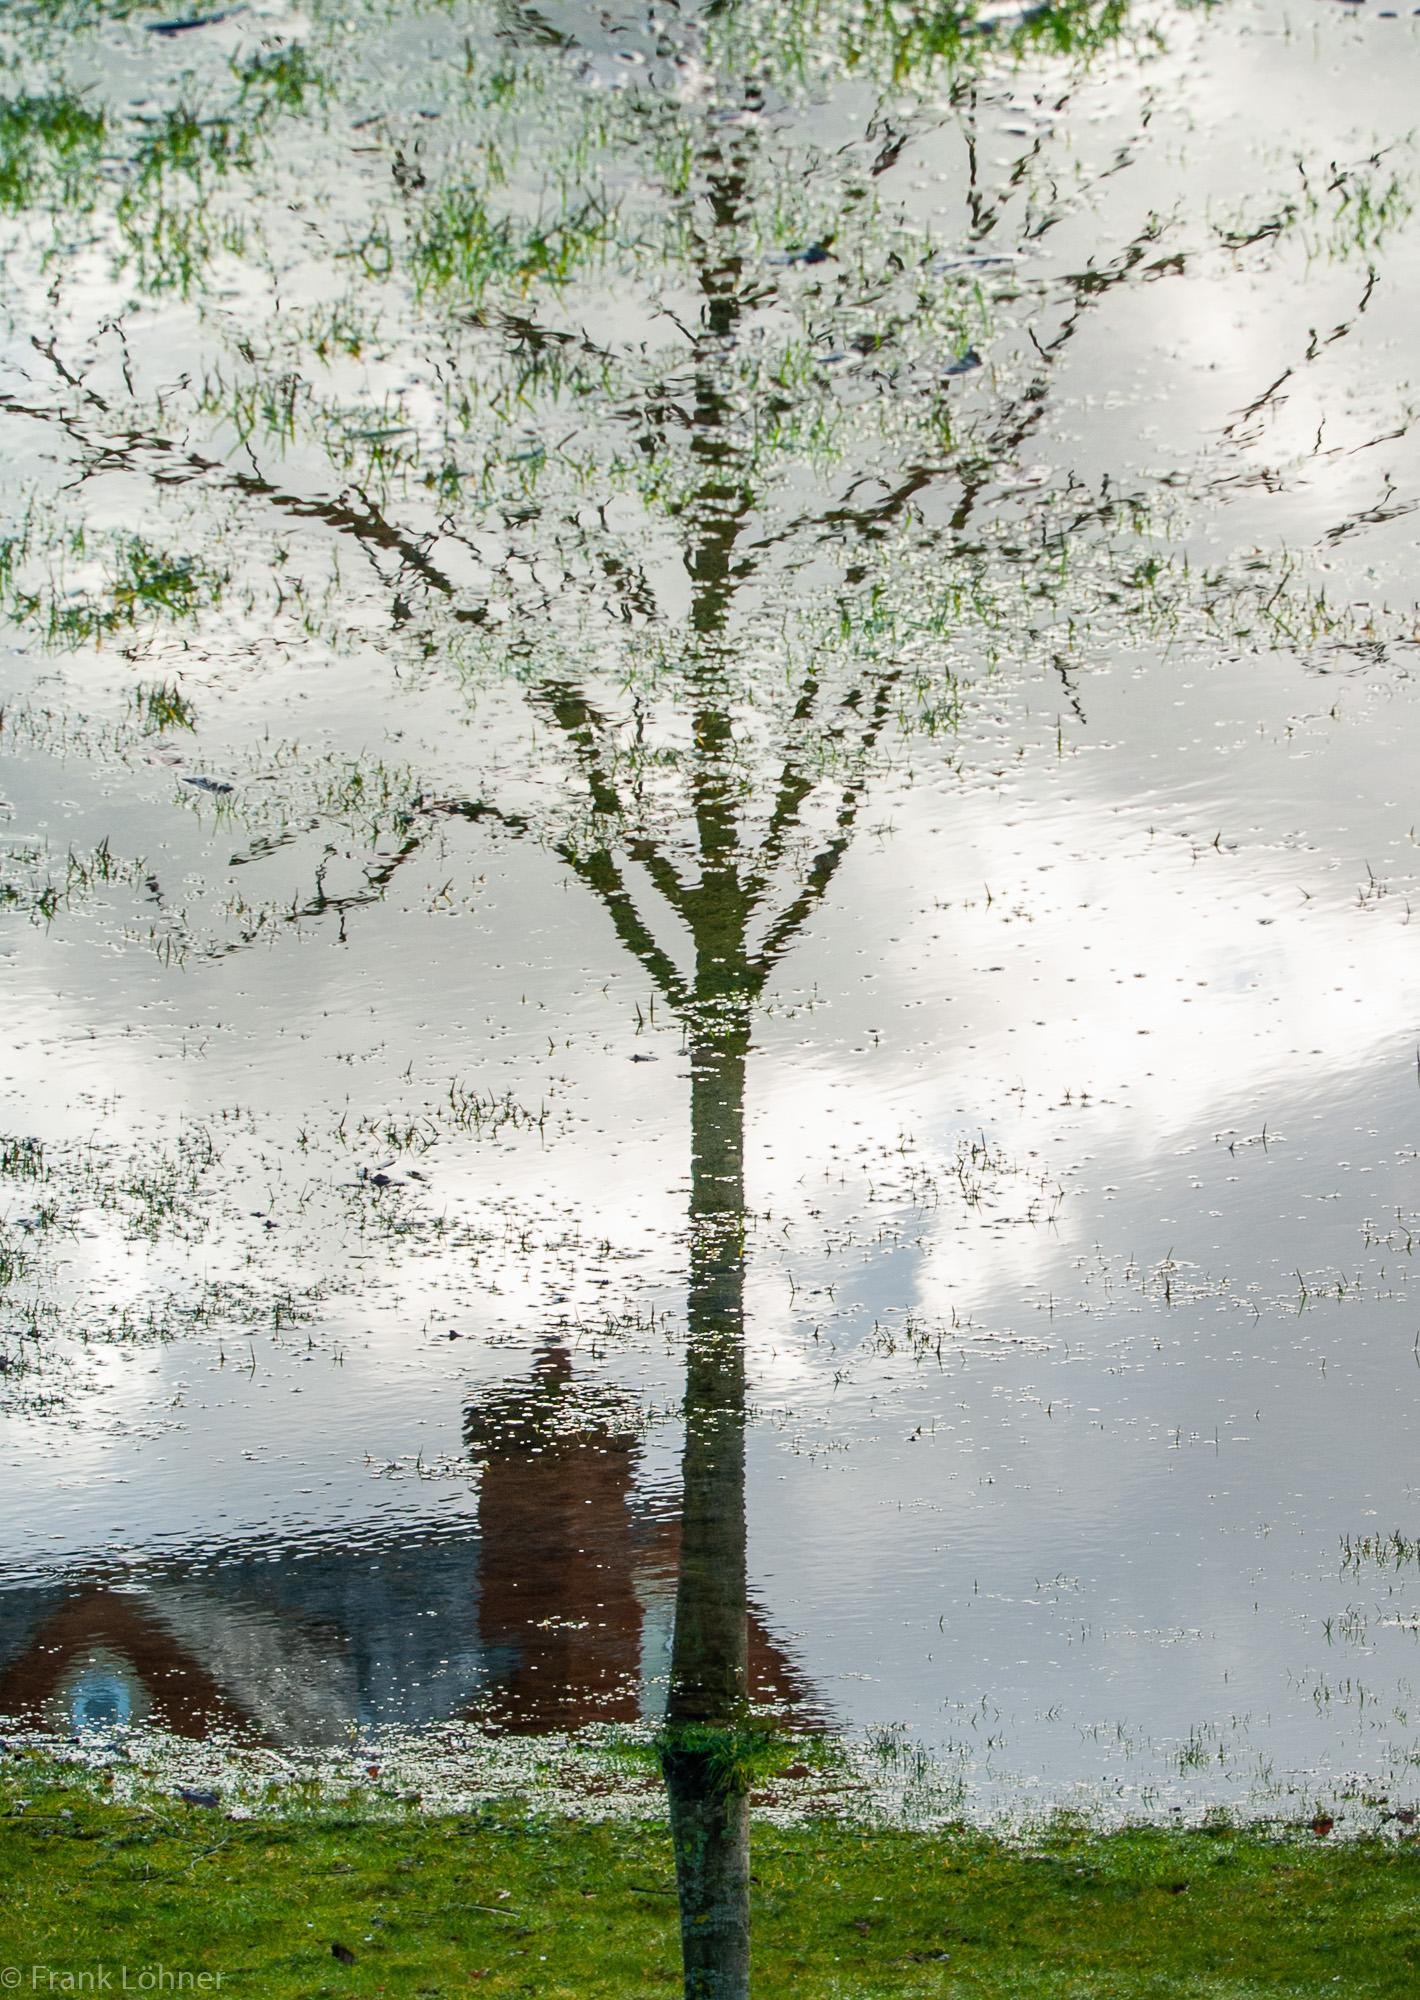 Tree-reflection